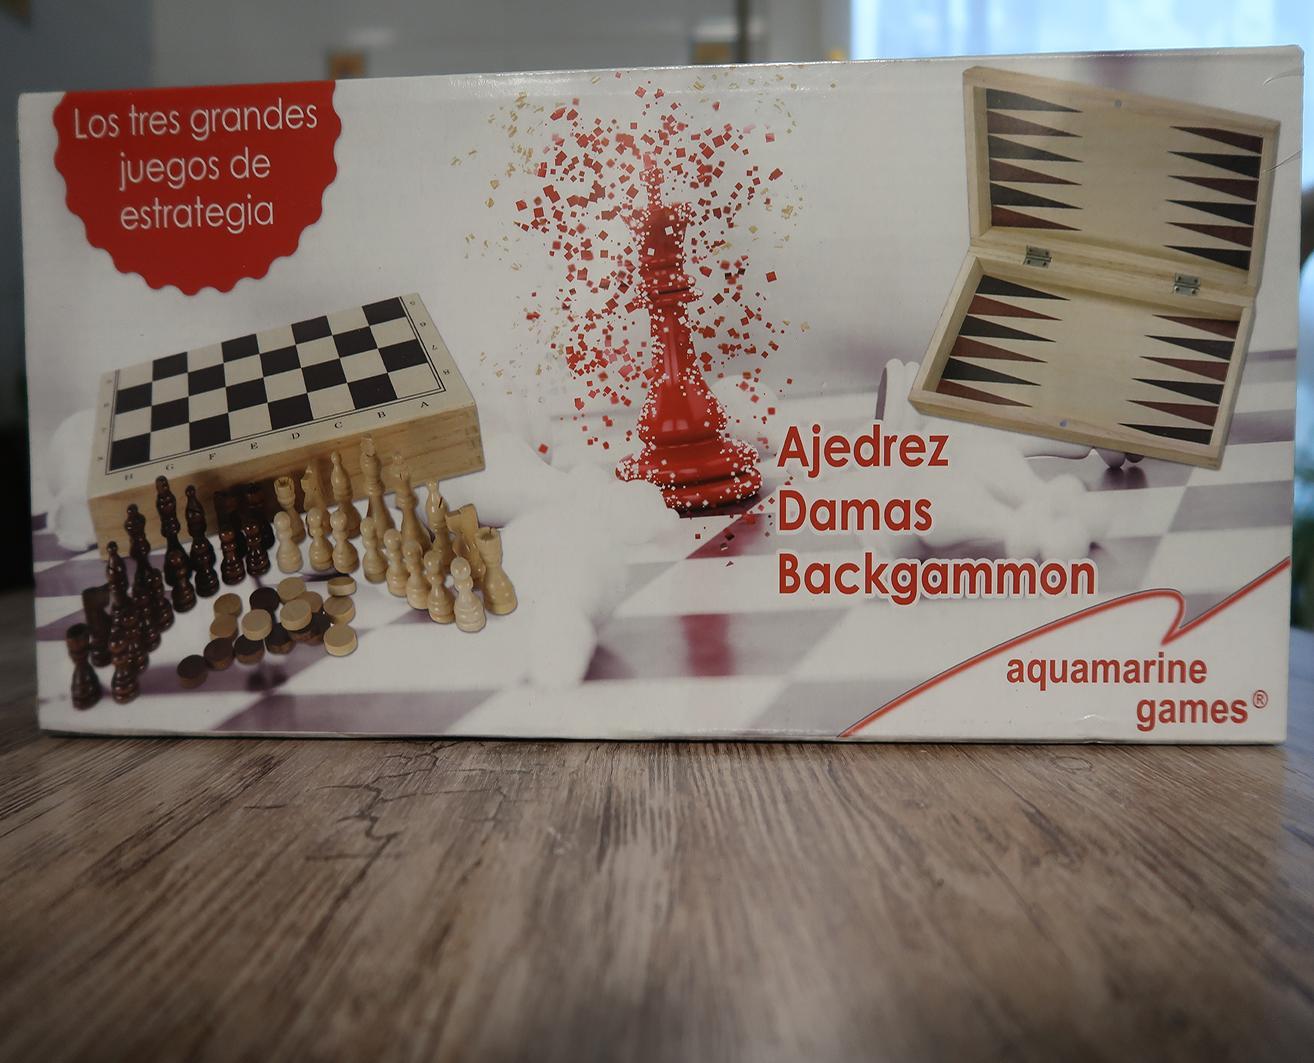 Estuche 3 en 1 Ajedrez-Damas-Backgammon (aquamarine game) madera